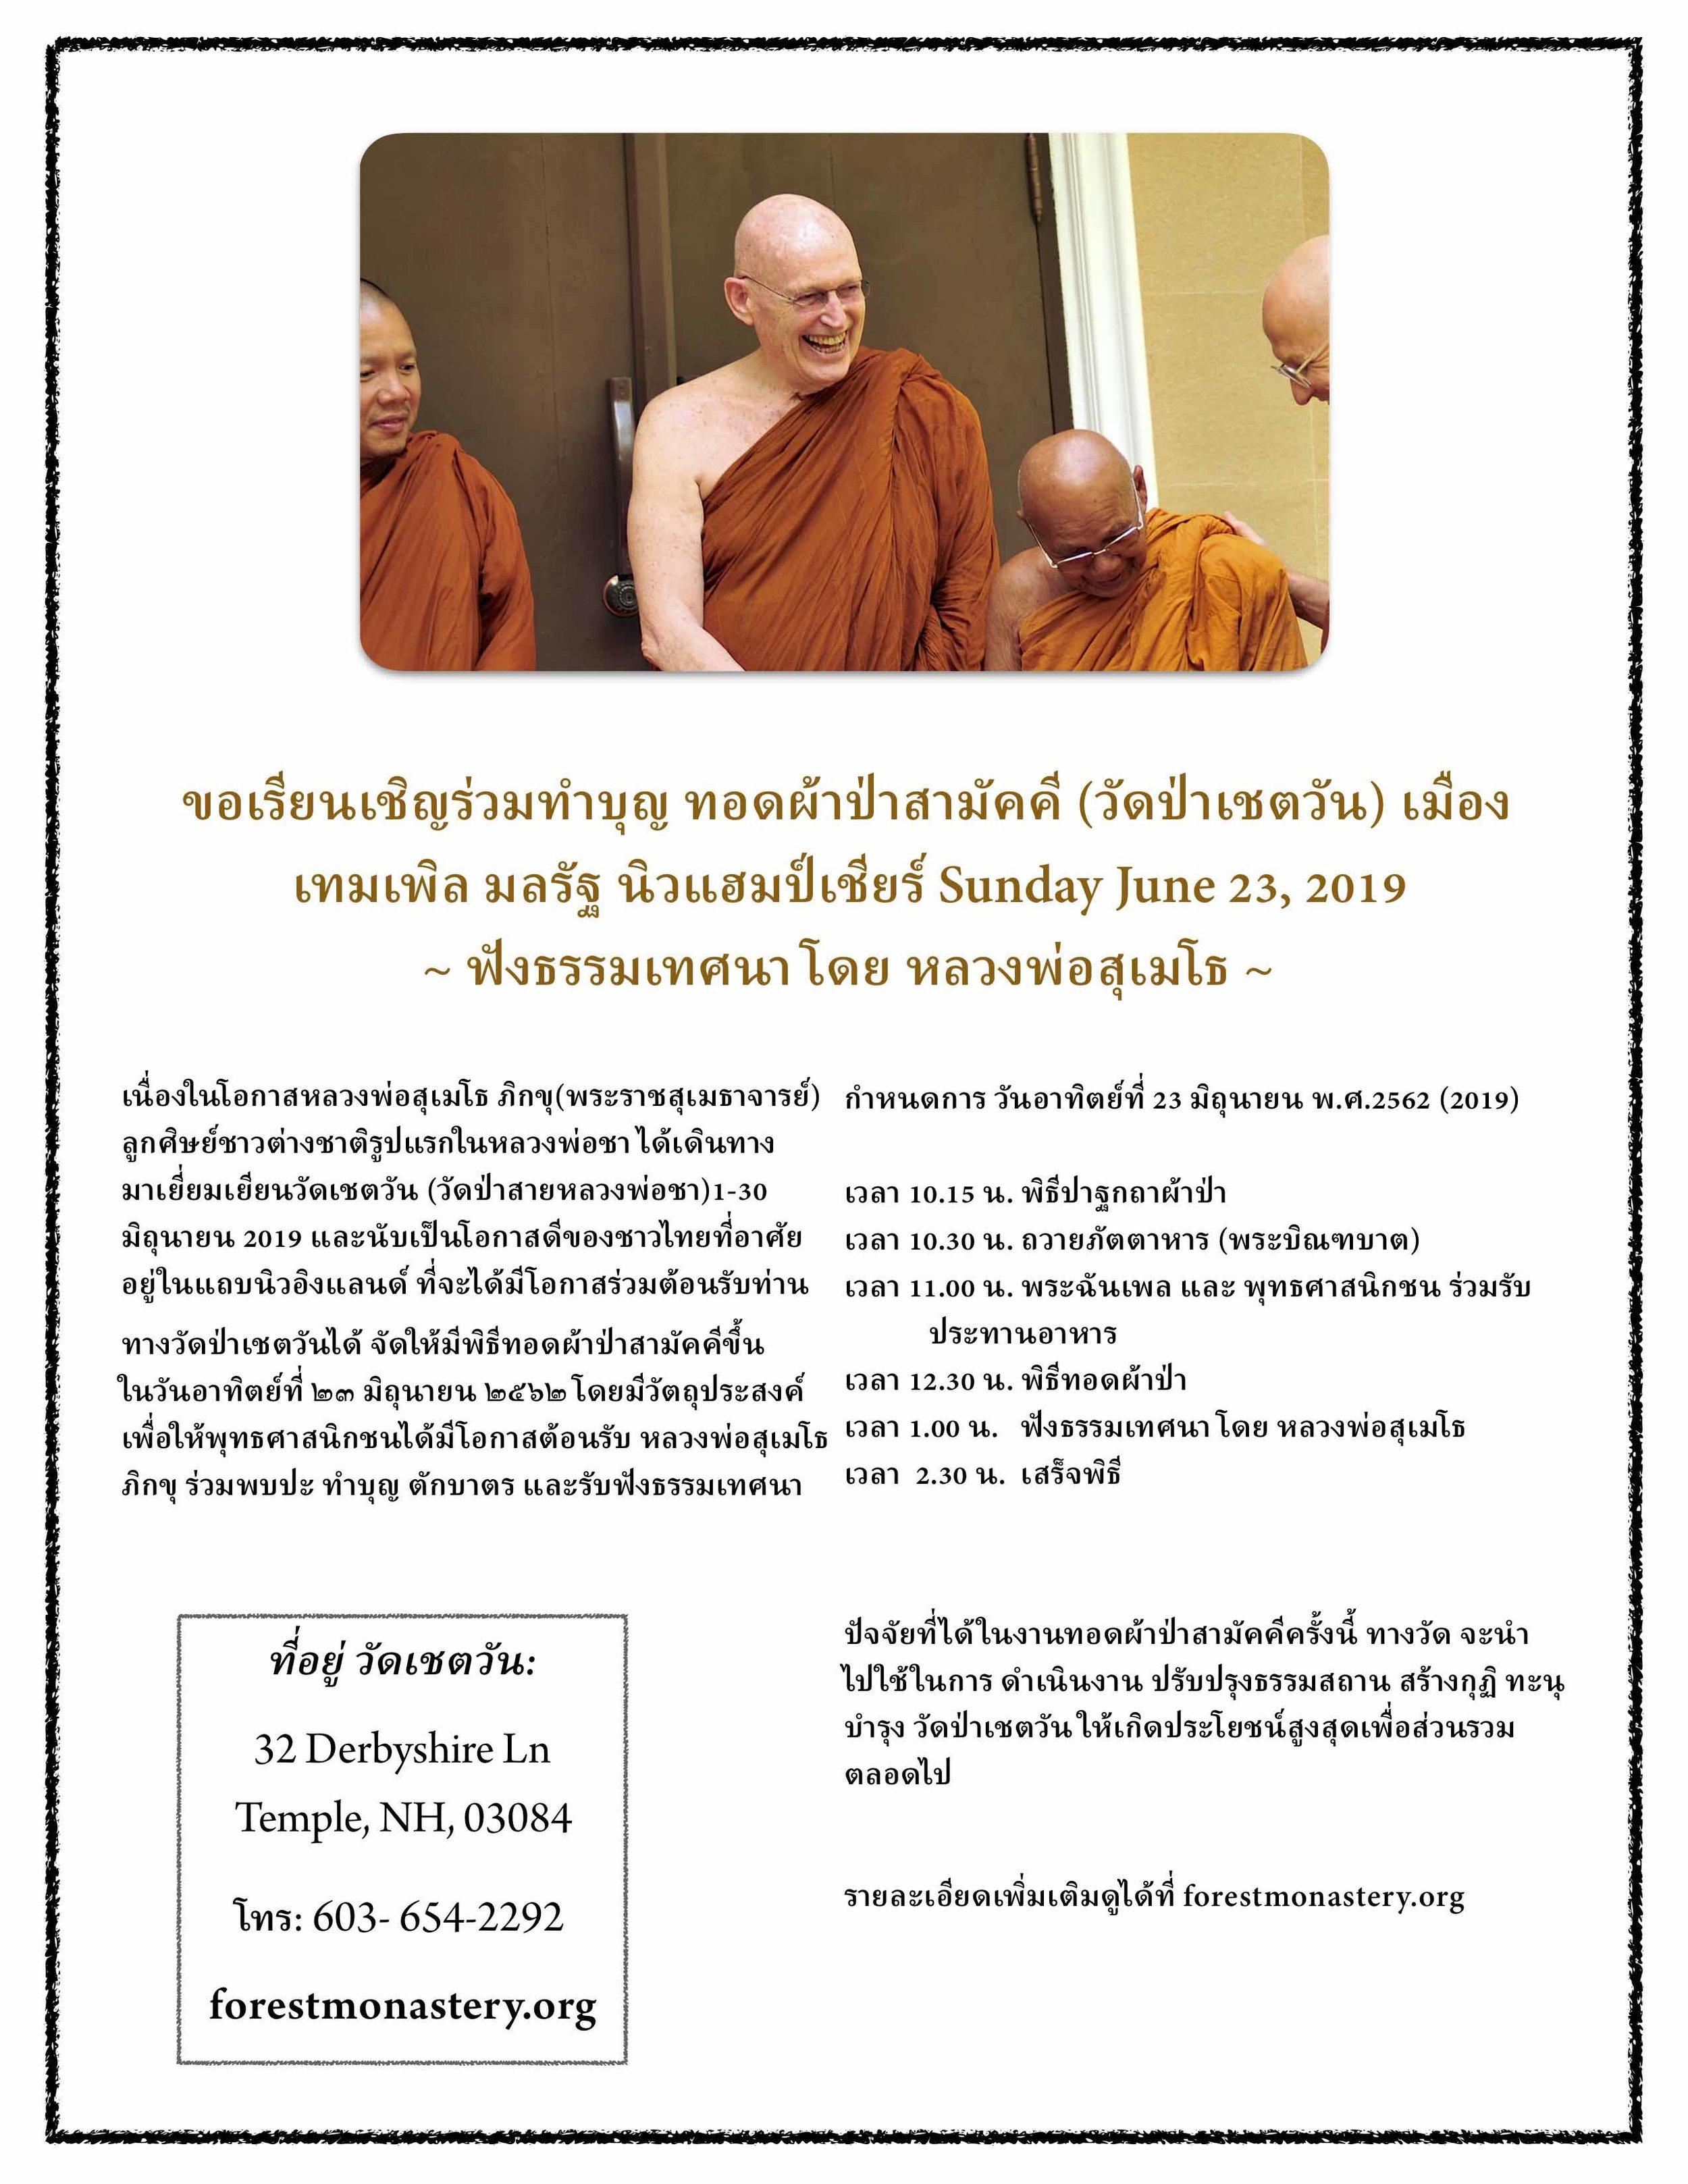 2019-6-23 Pa Bah - Thai – Image.jpeg